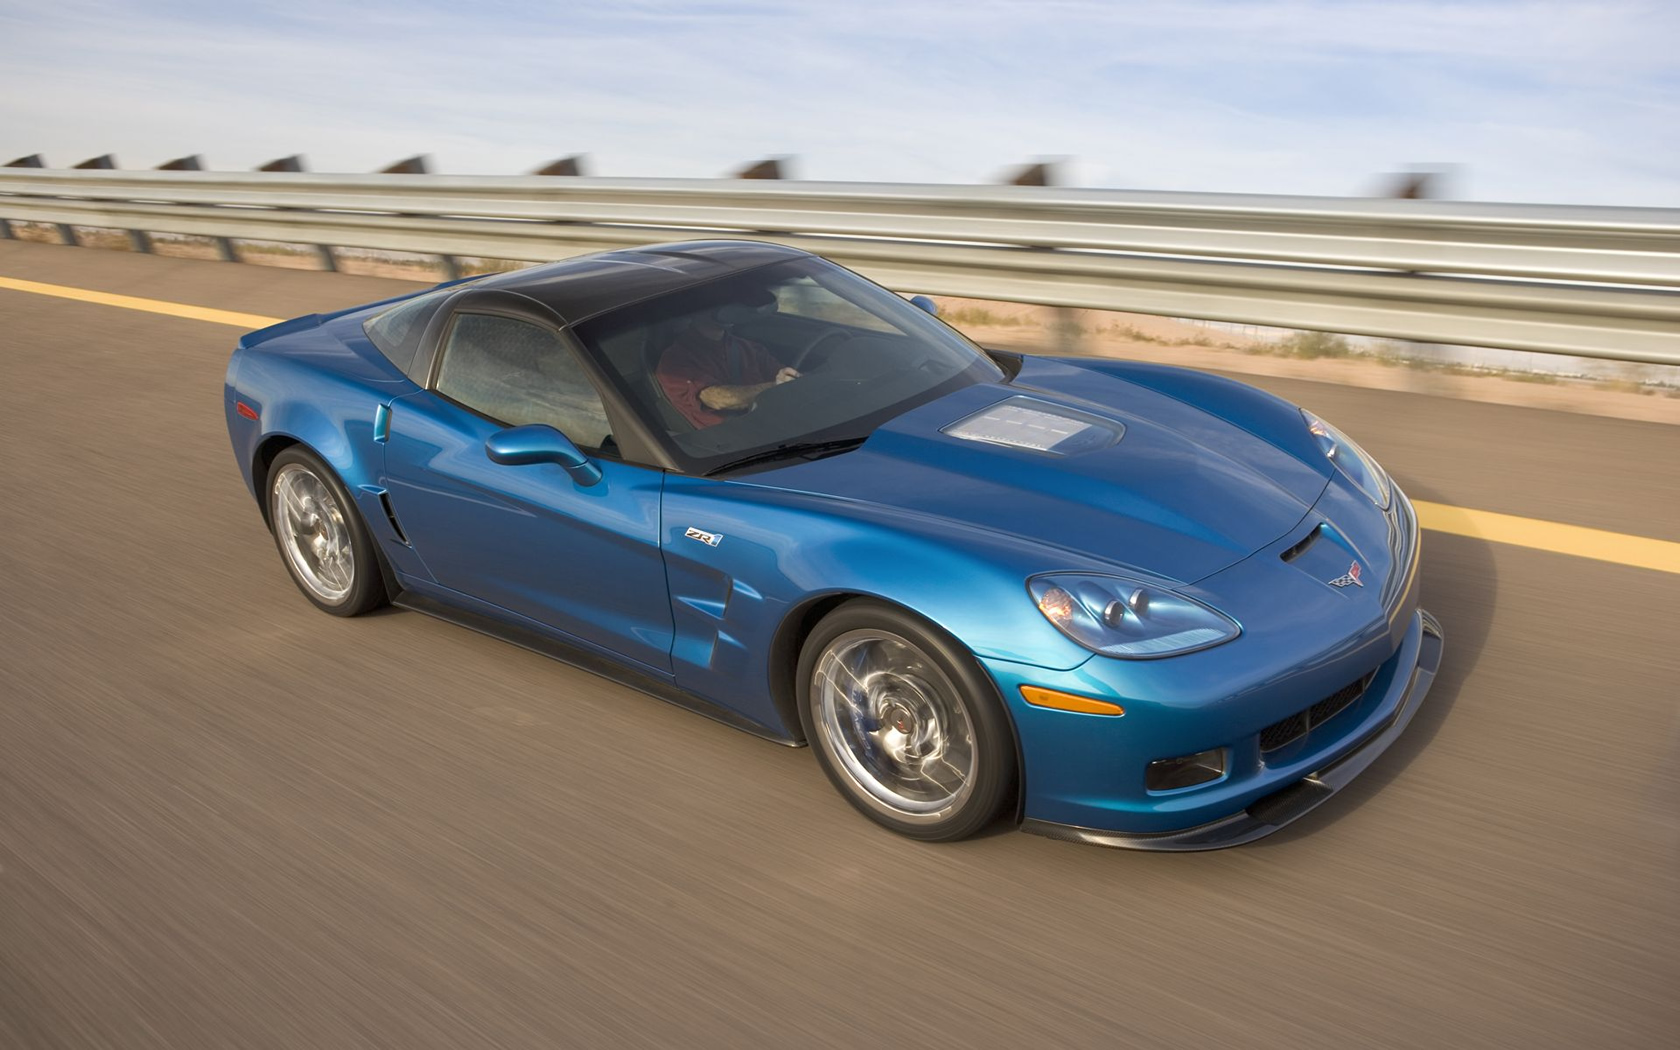 Chevrolet Corvette azul - 1680x1050